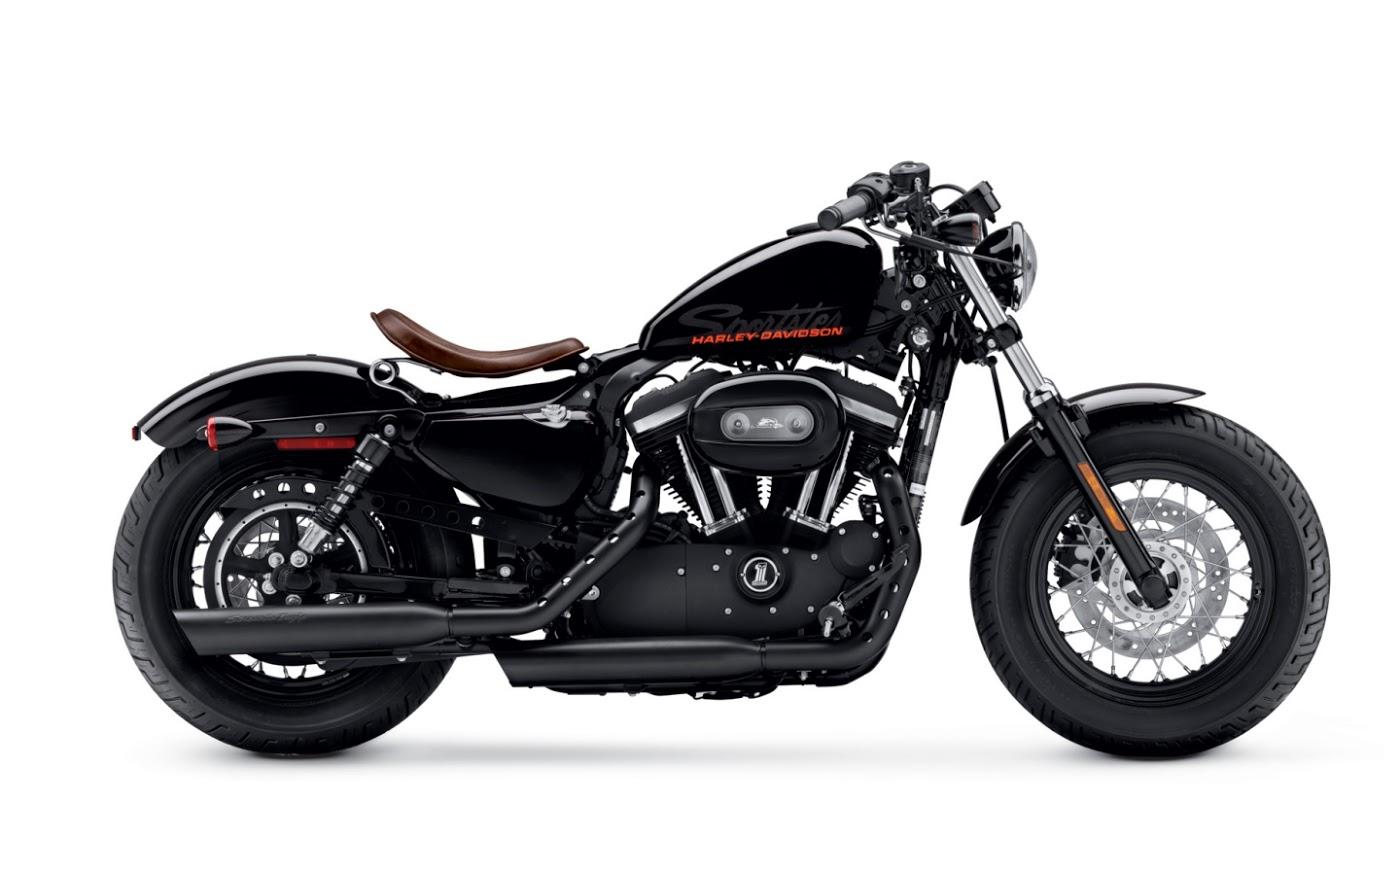 Davidson XL 1200 X Sportster Forty Eight   Harley Davidson Wallpaper 1400x875